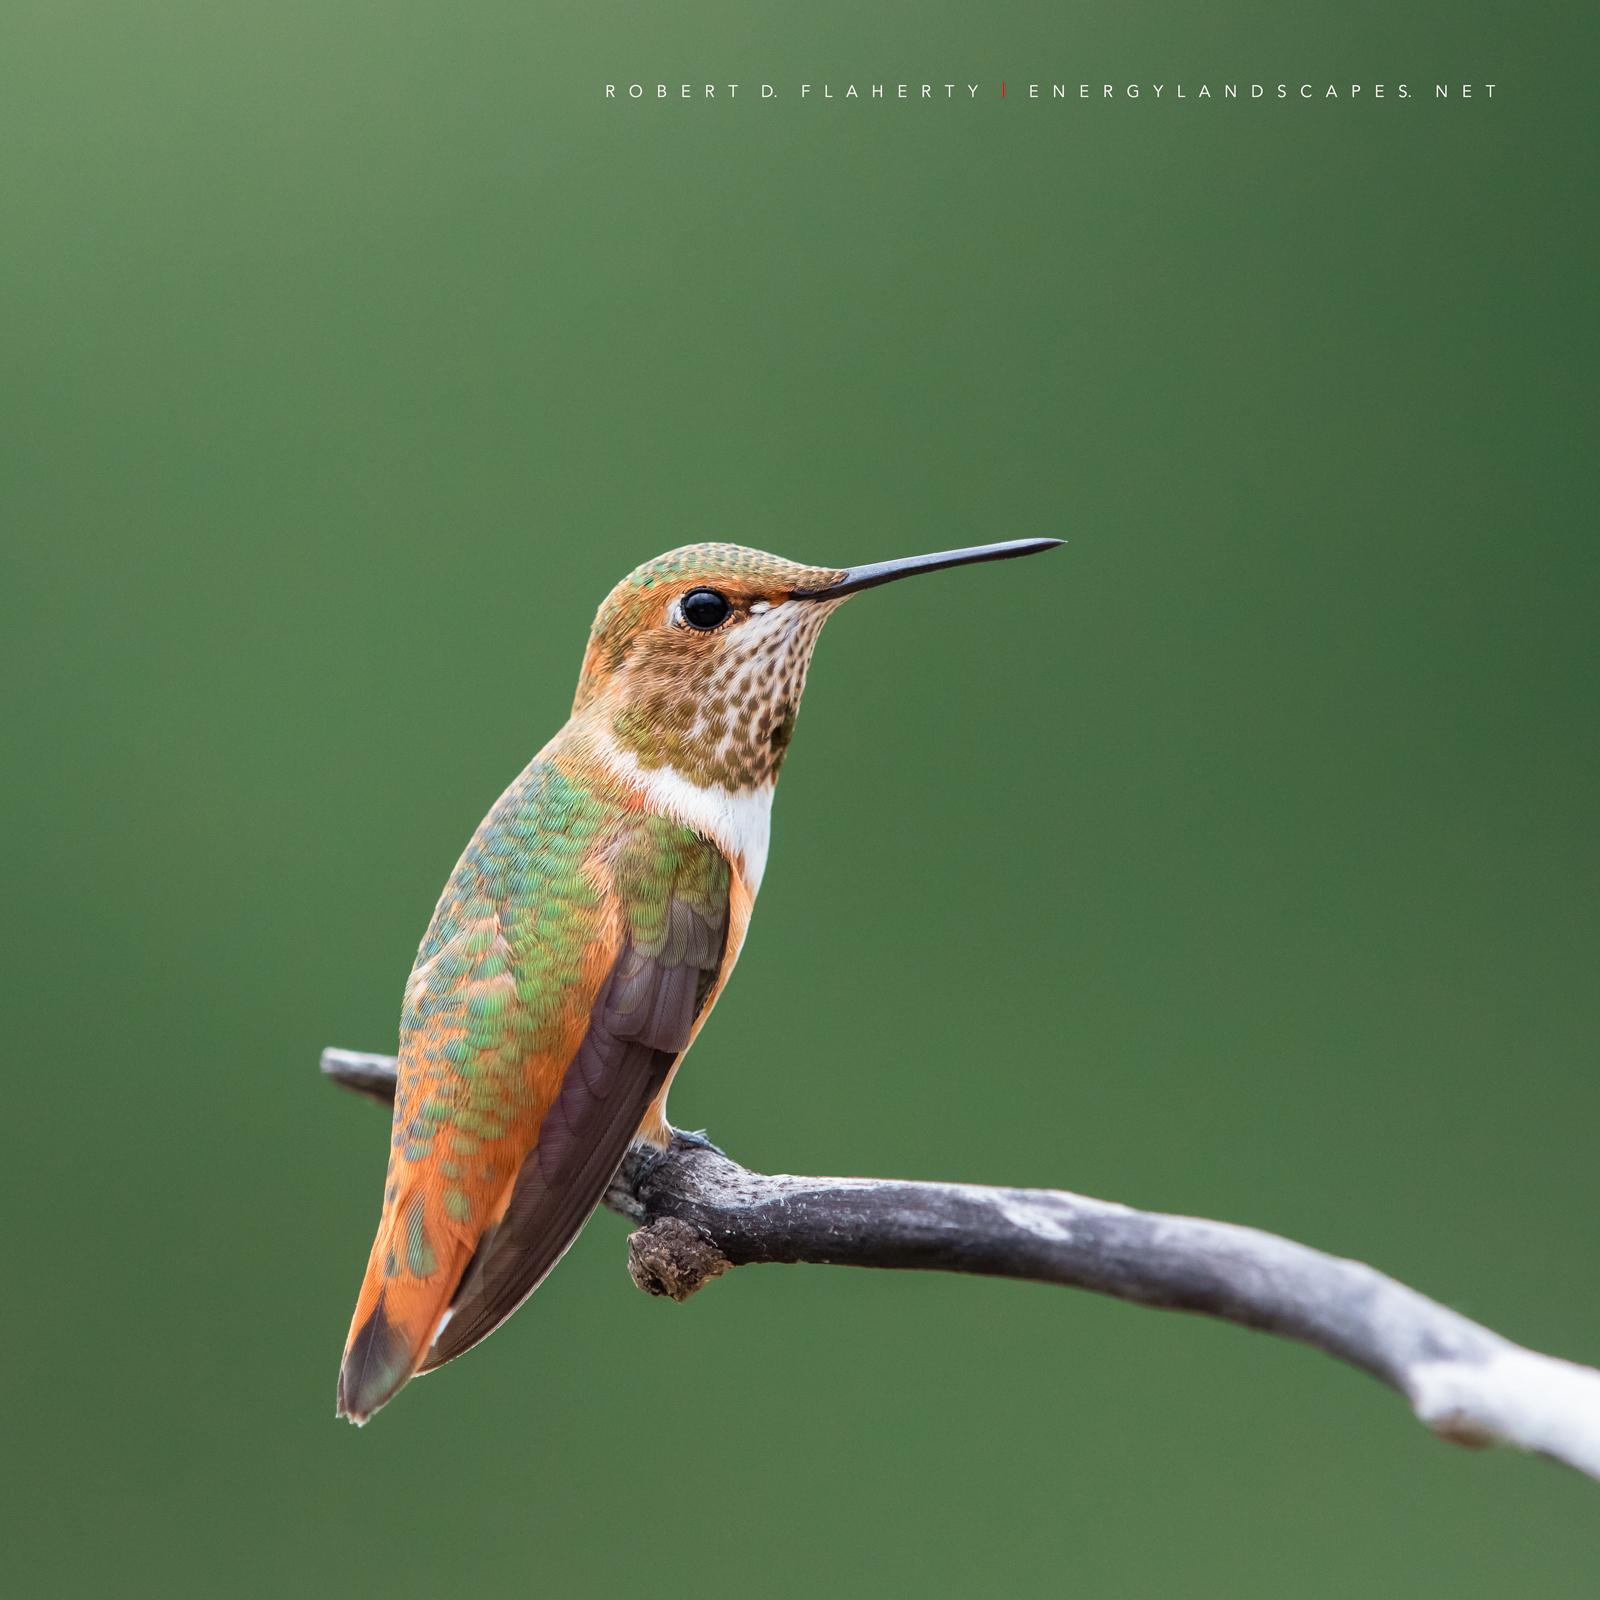 Brush Strokes Of Nature, hummingbird, hummingbirds, fine art photography, New Mexico, South Central Mountains, monsoon, Ruidoso, Ruidoso New Mexico, rain, Thunderstorm, fine art, photo